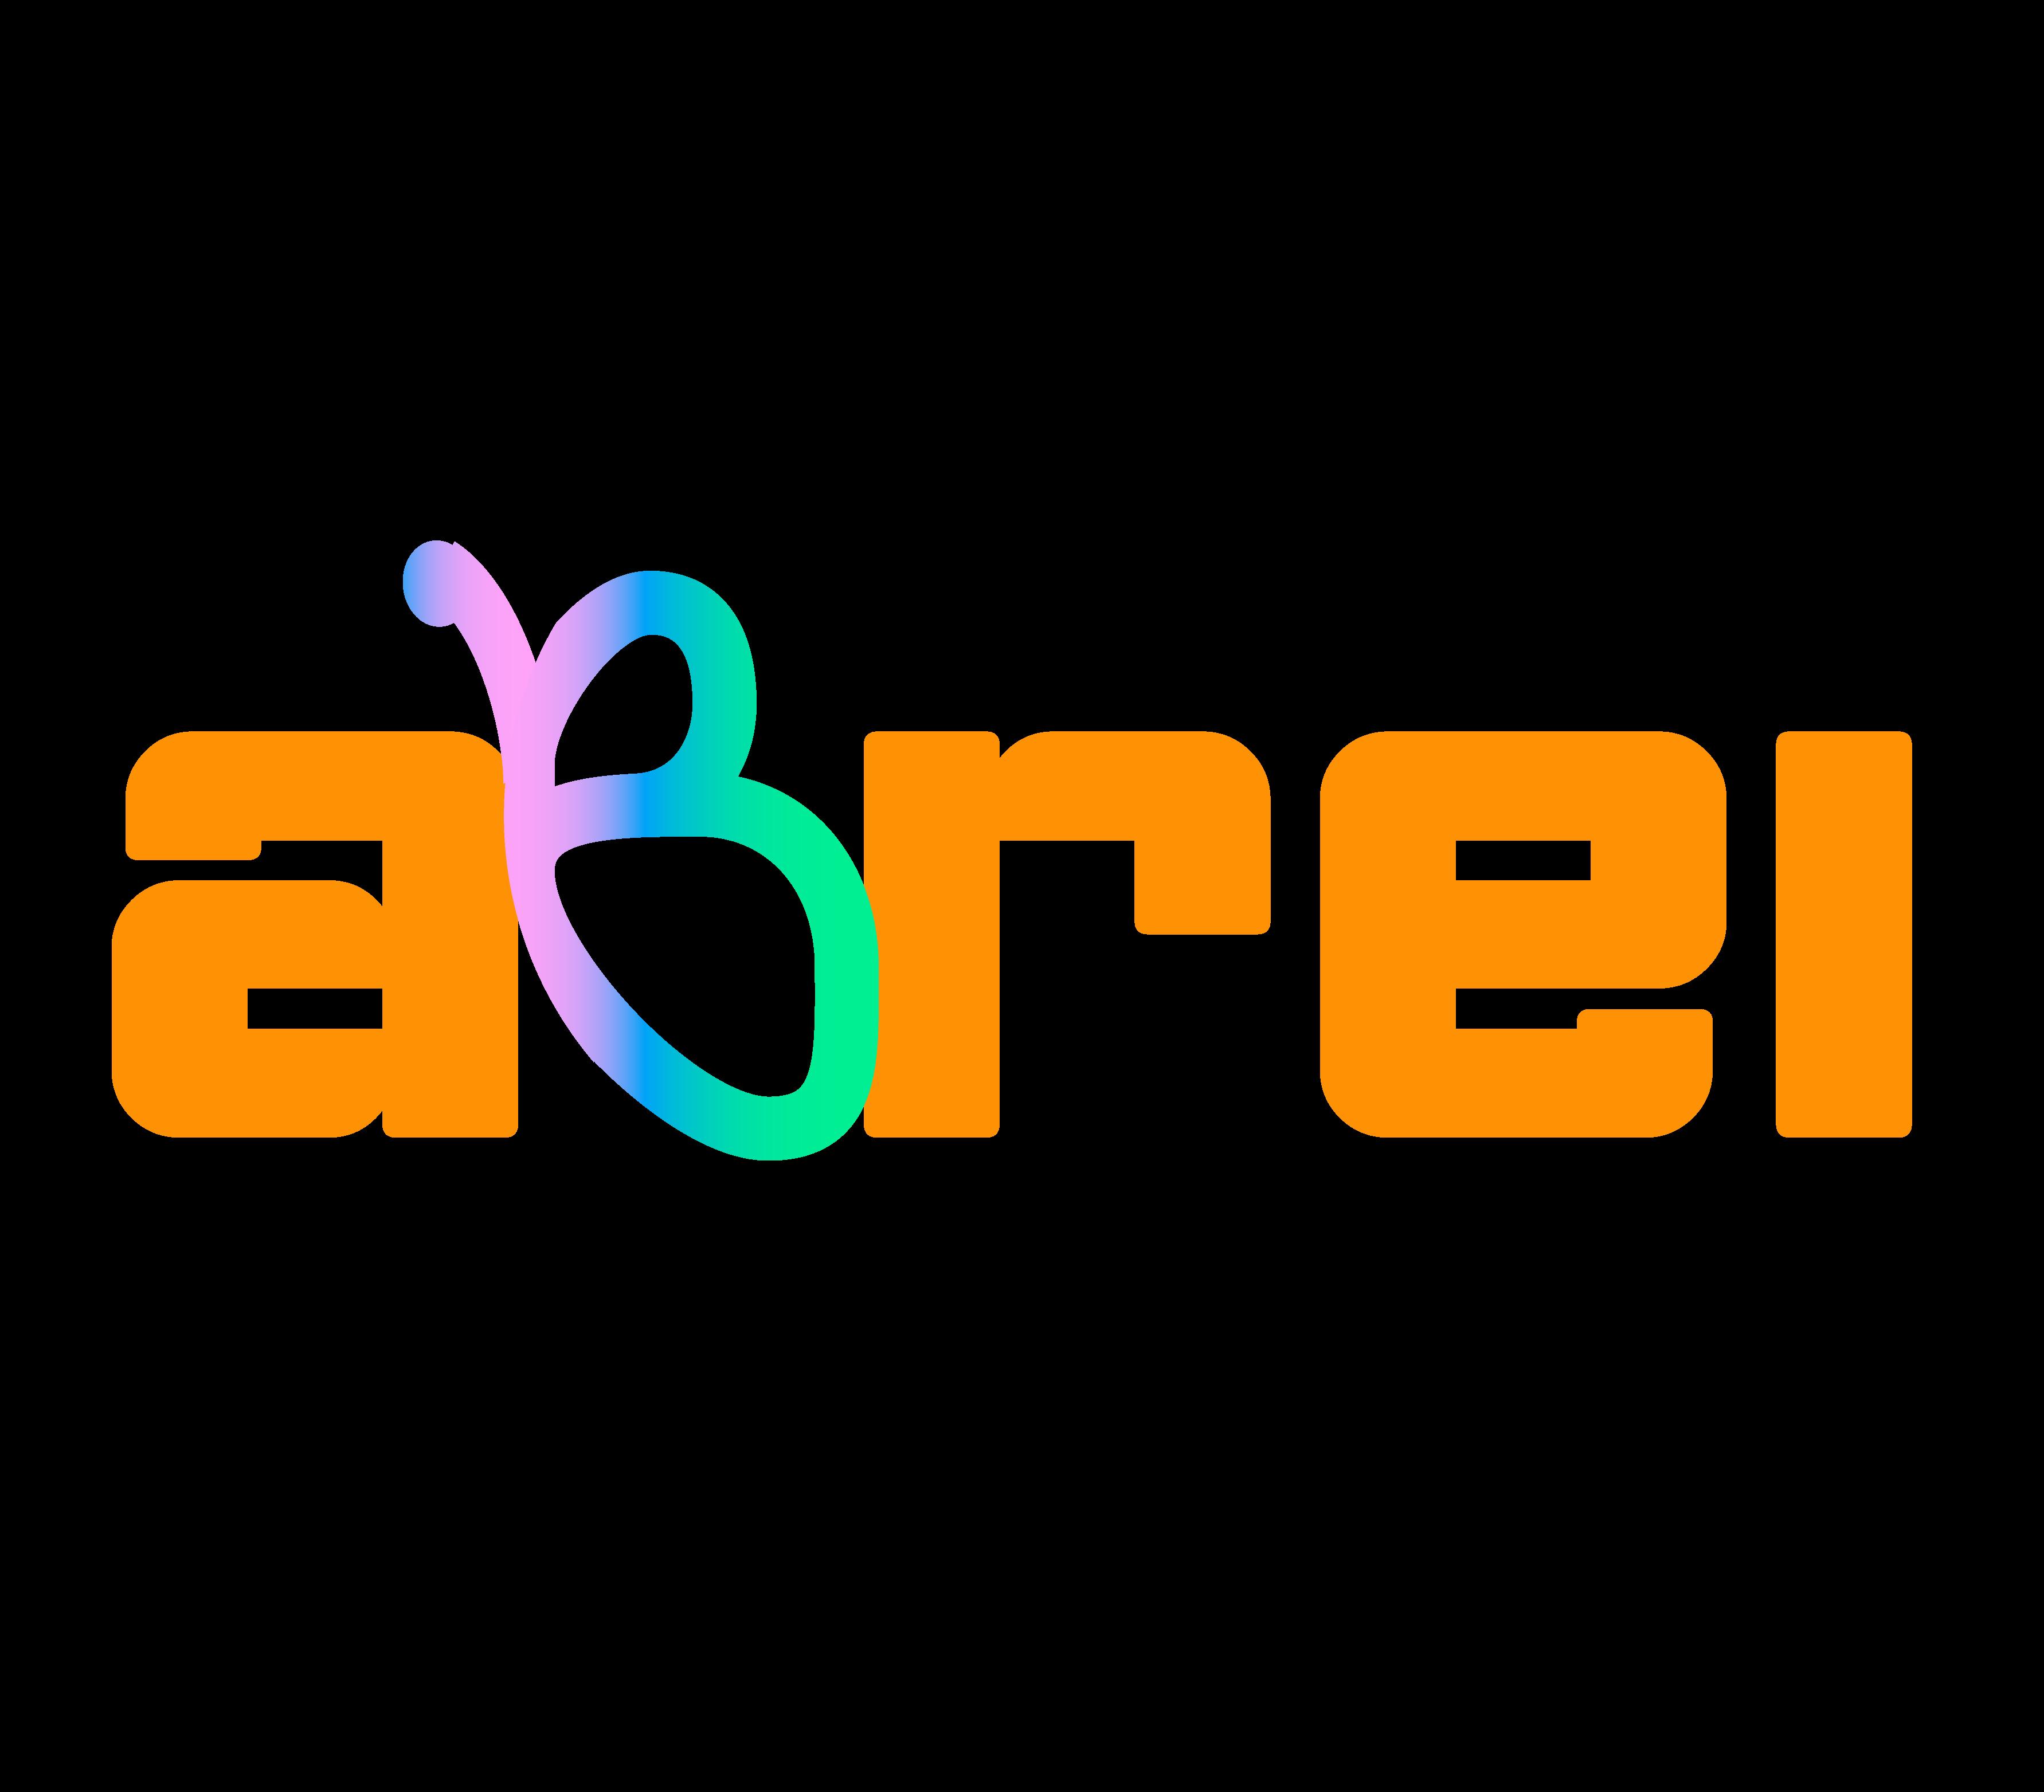 http://www.abreibr.org/